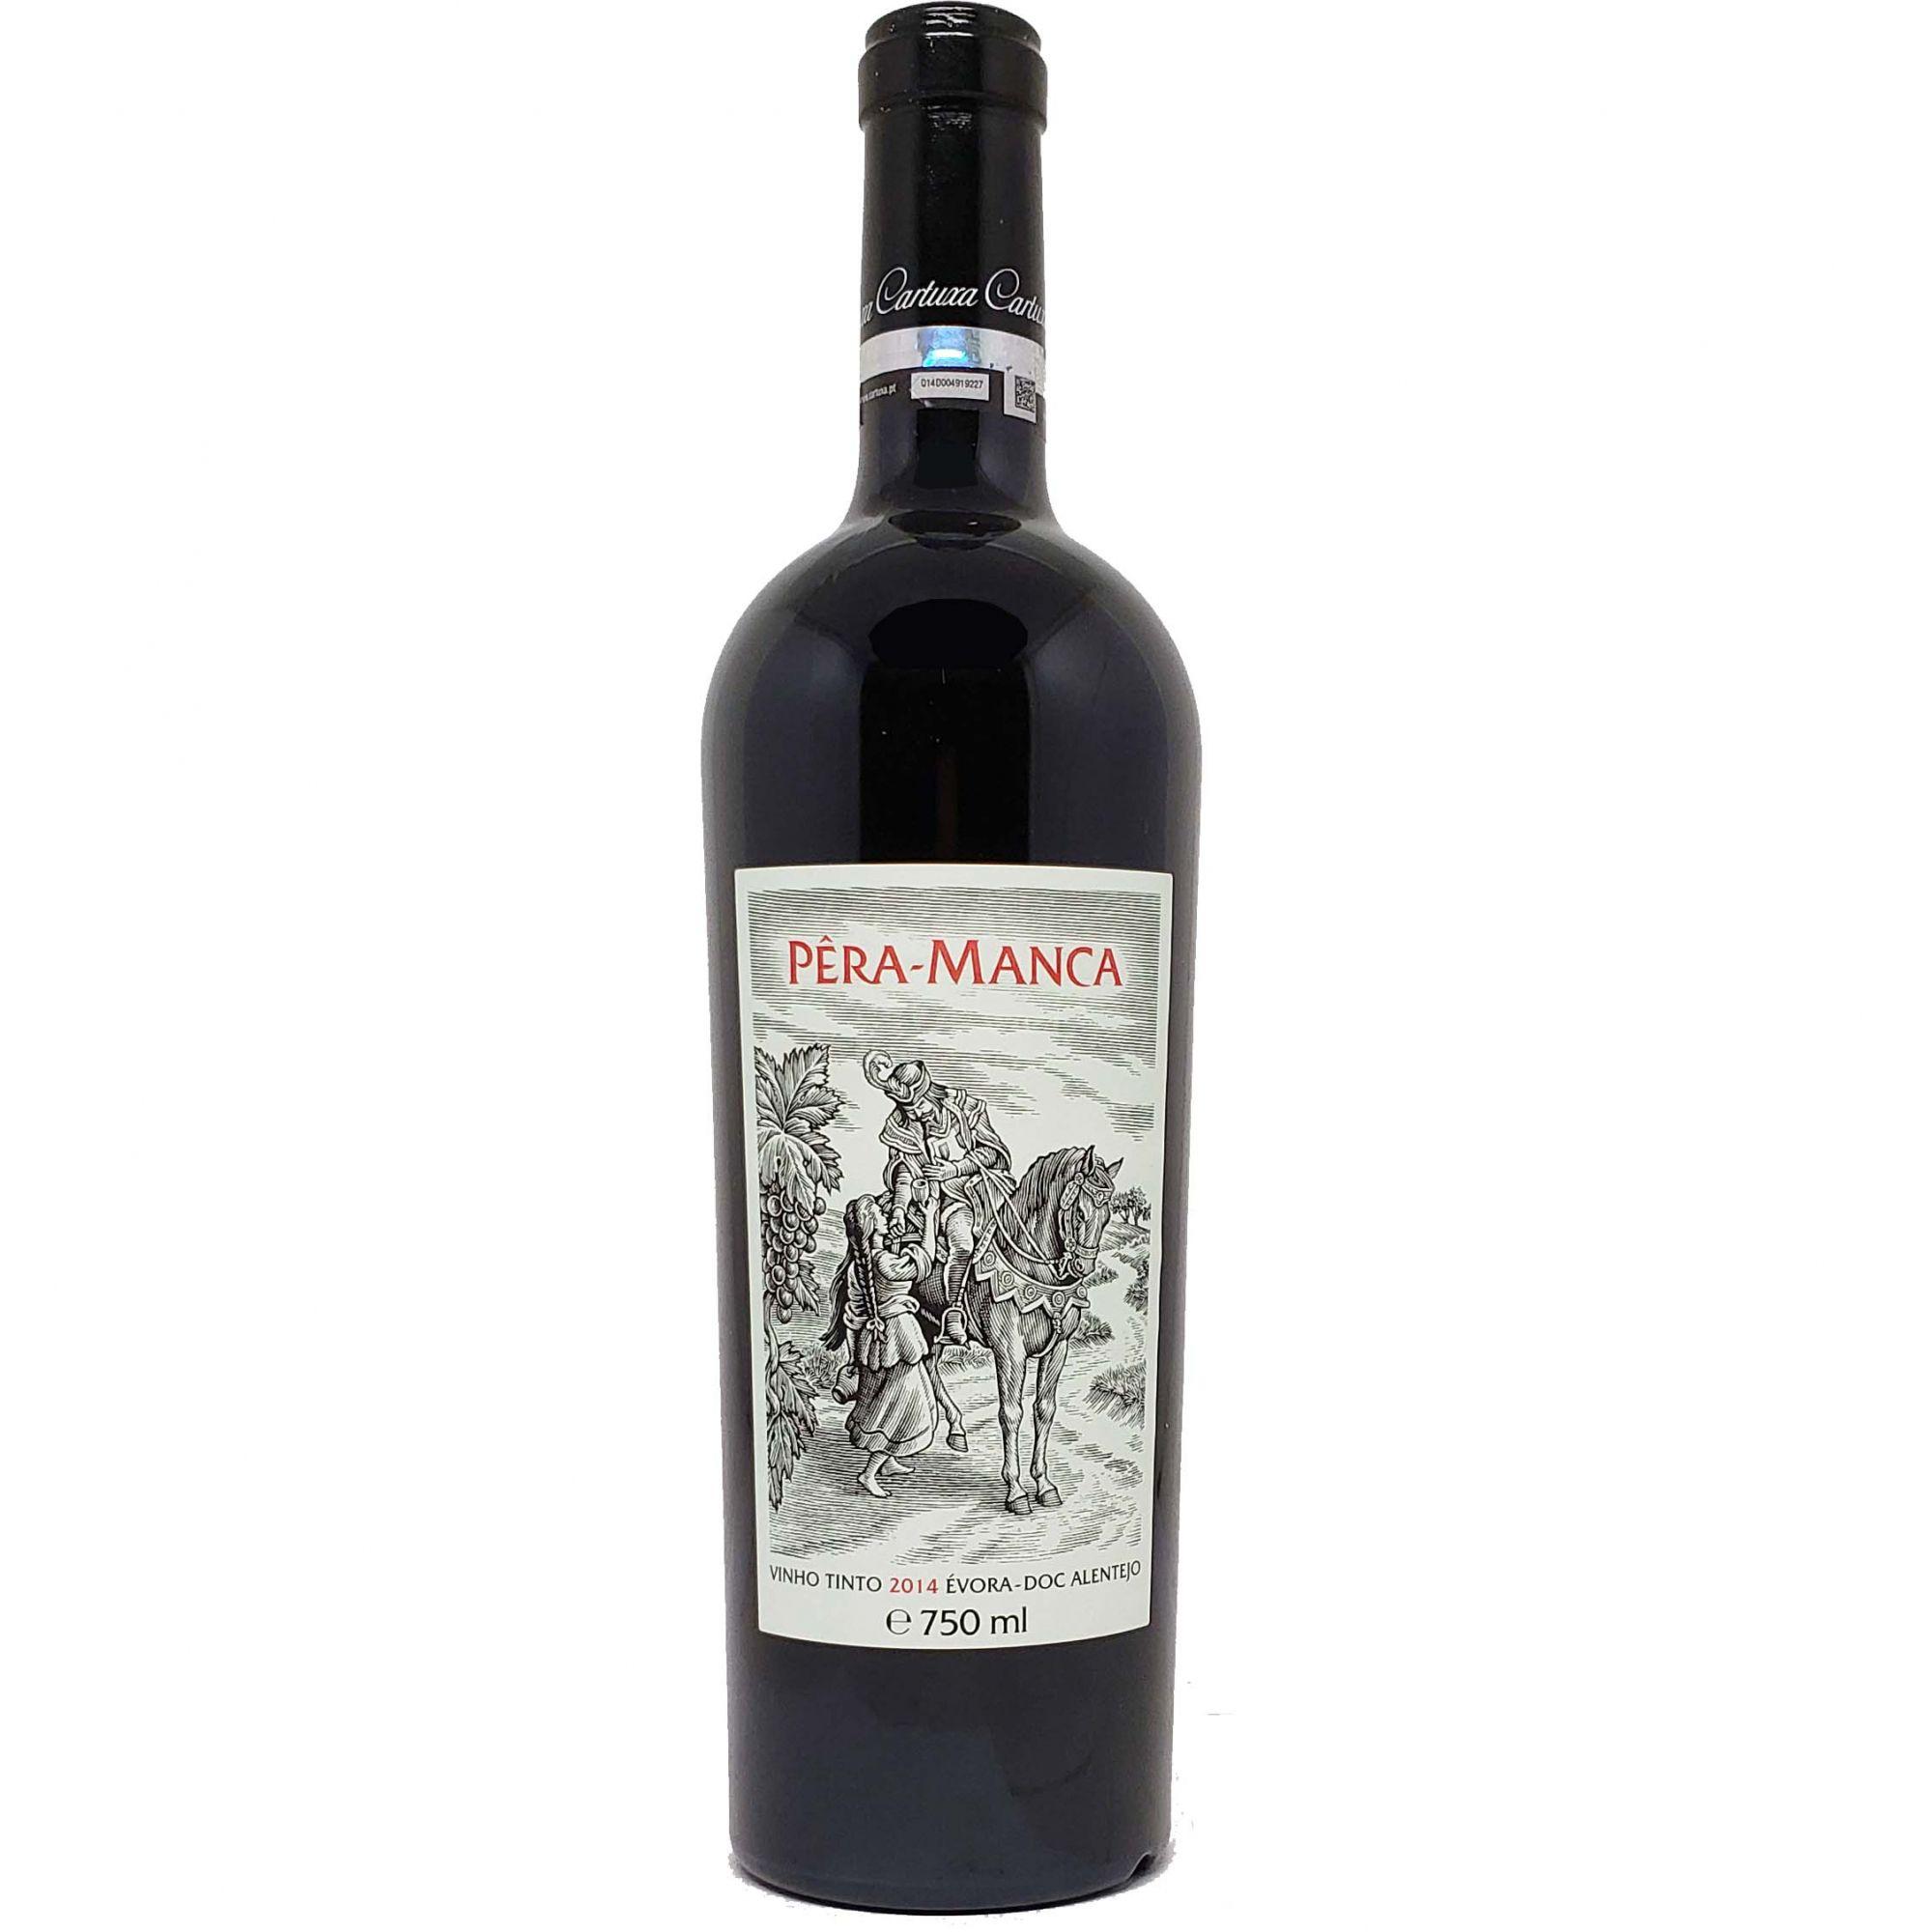 Vinho Tinto Pera Manca 2014  - 750ml -